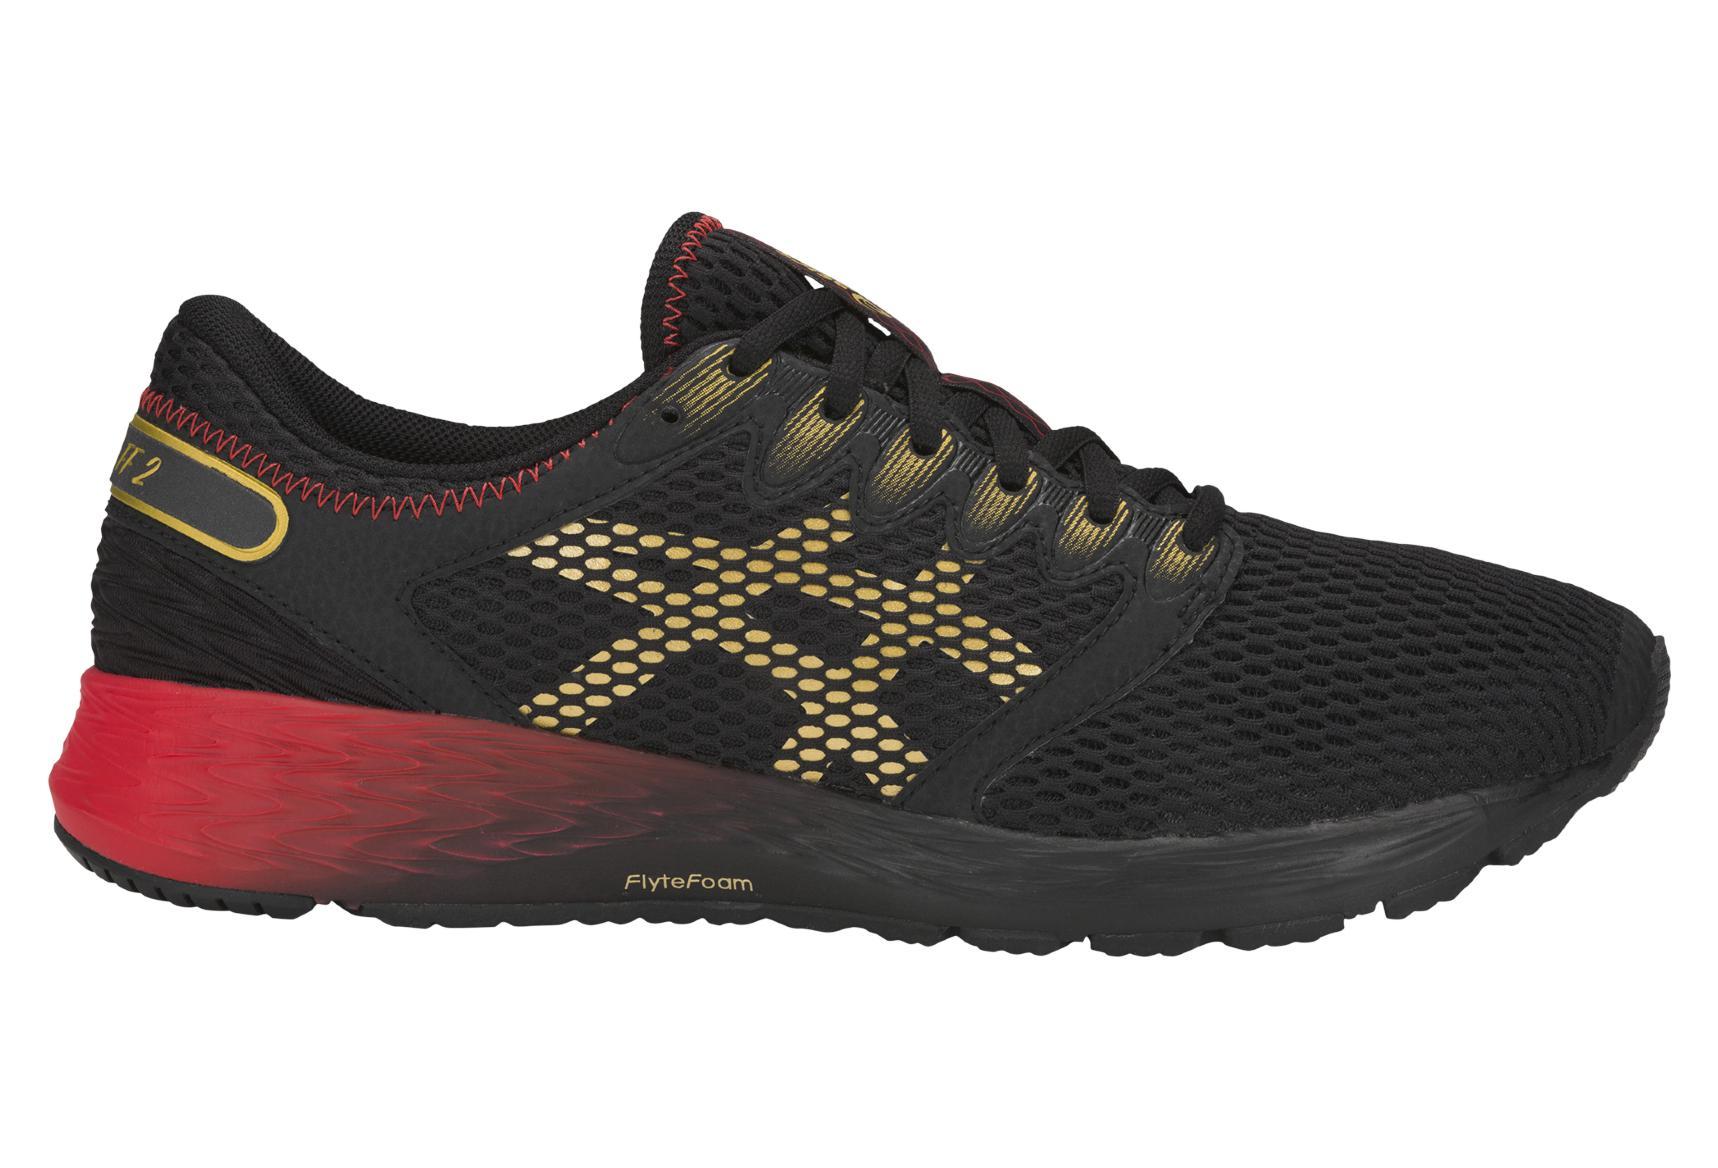 quality design 0ba89 b04cd Asics Shoes Run Roadhawk FF 2 MUGEN Black Red